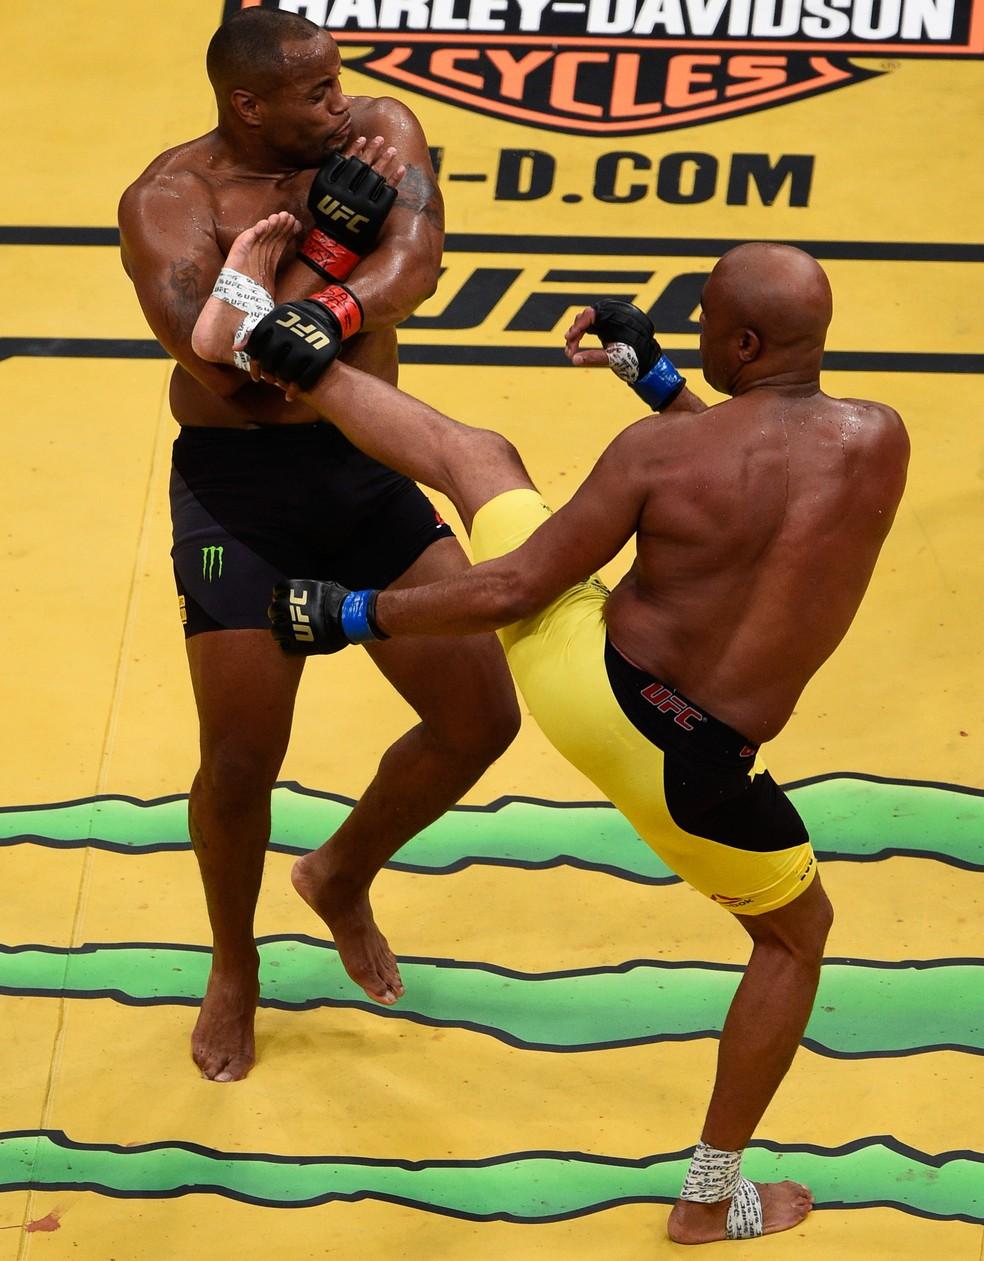 Anderson Silva acerta um chute no corpo de Daniel Cormier — Foto: Getty Images